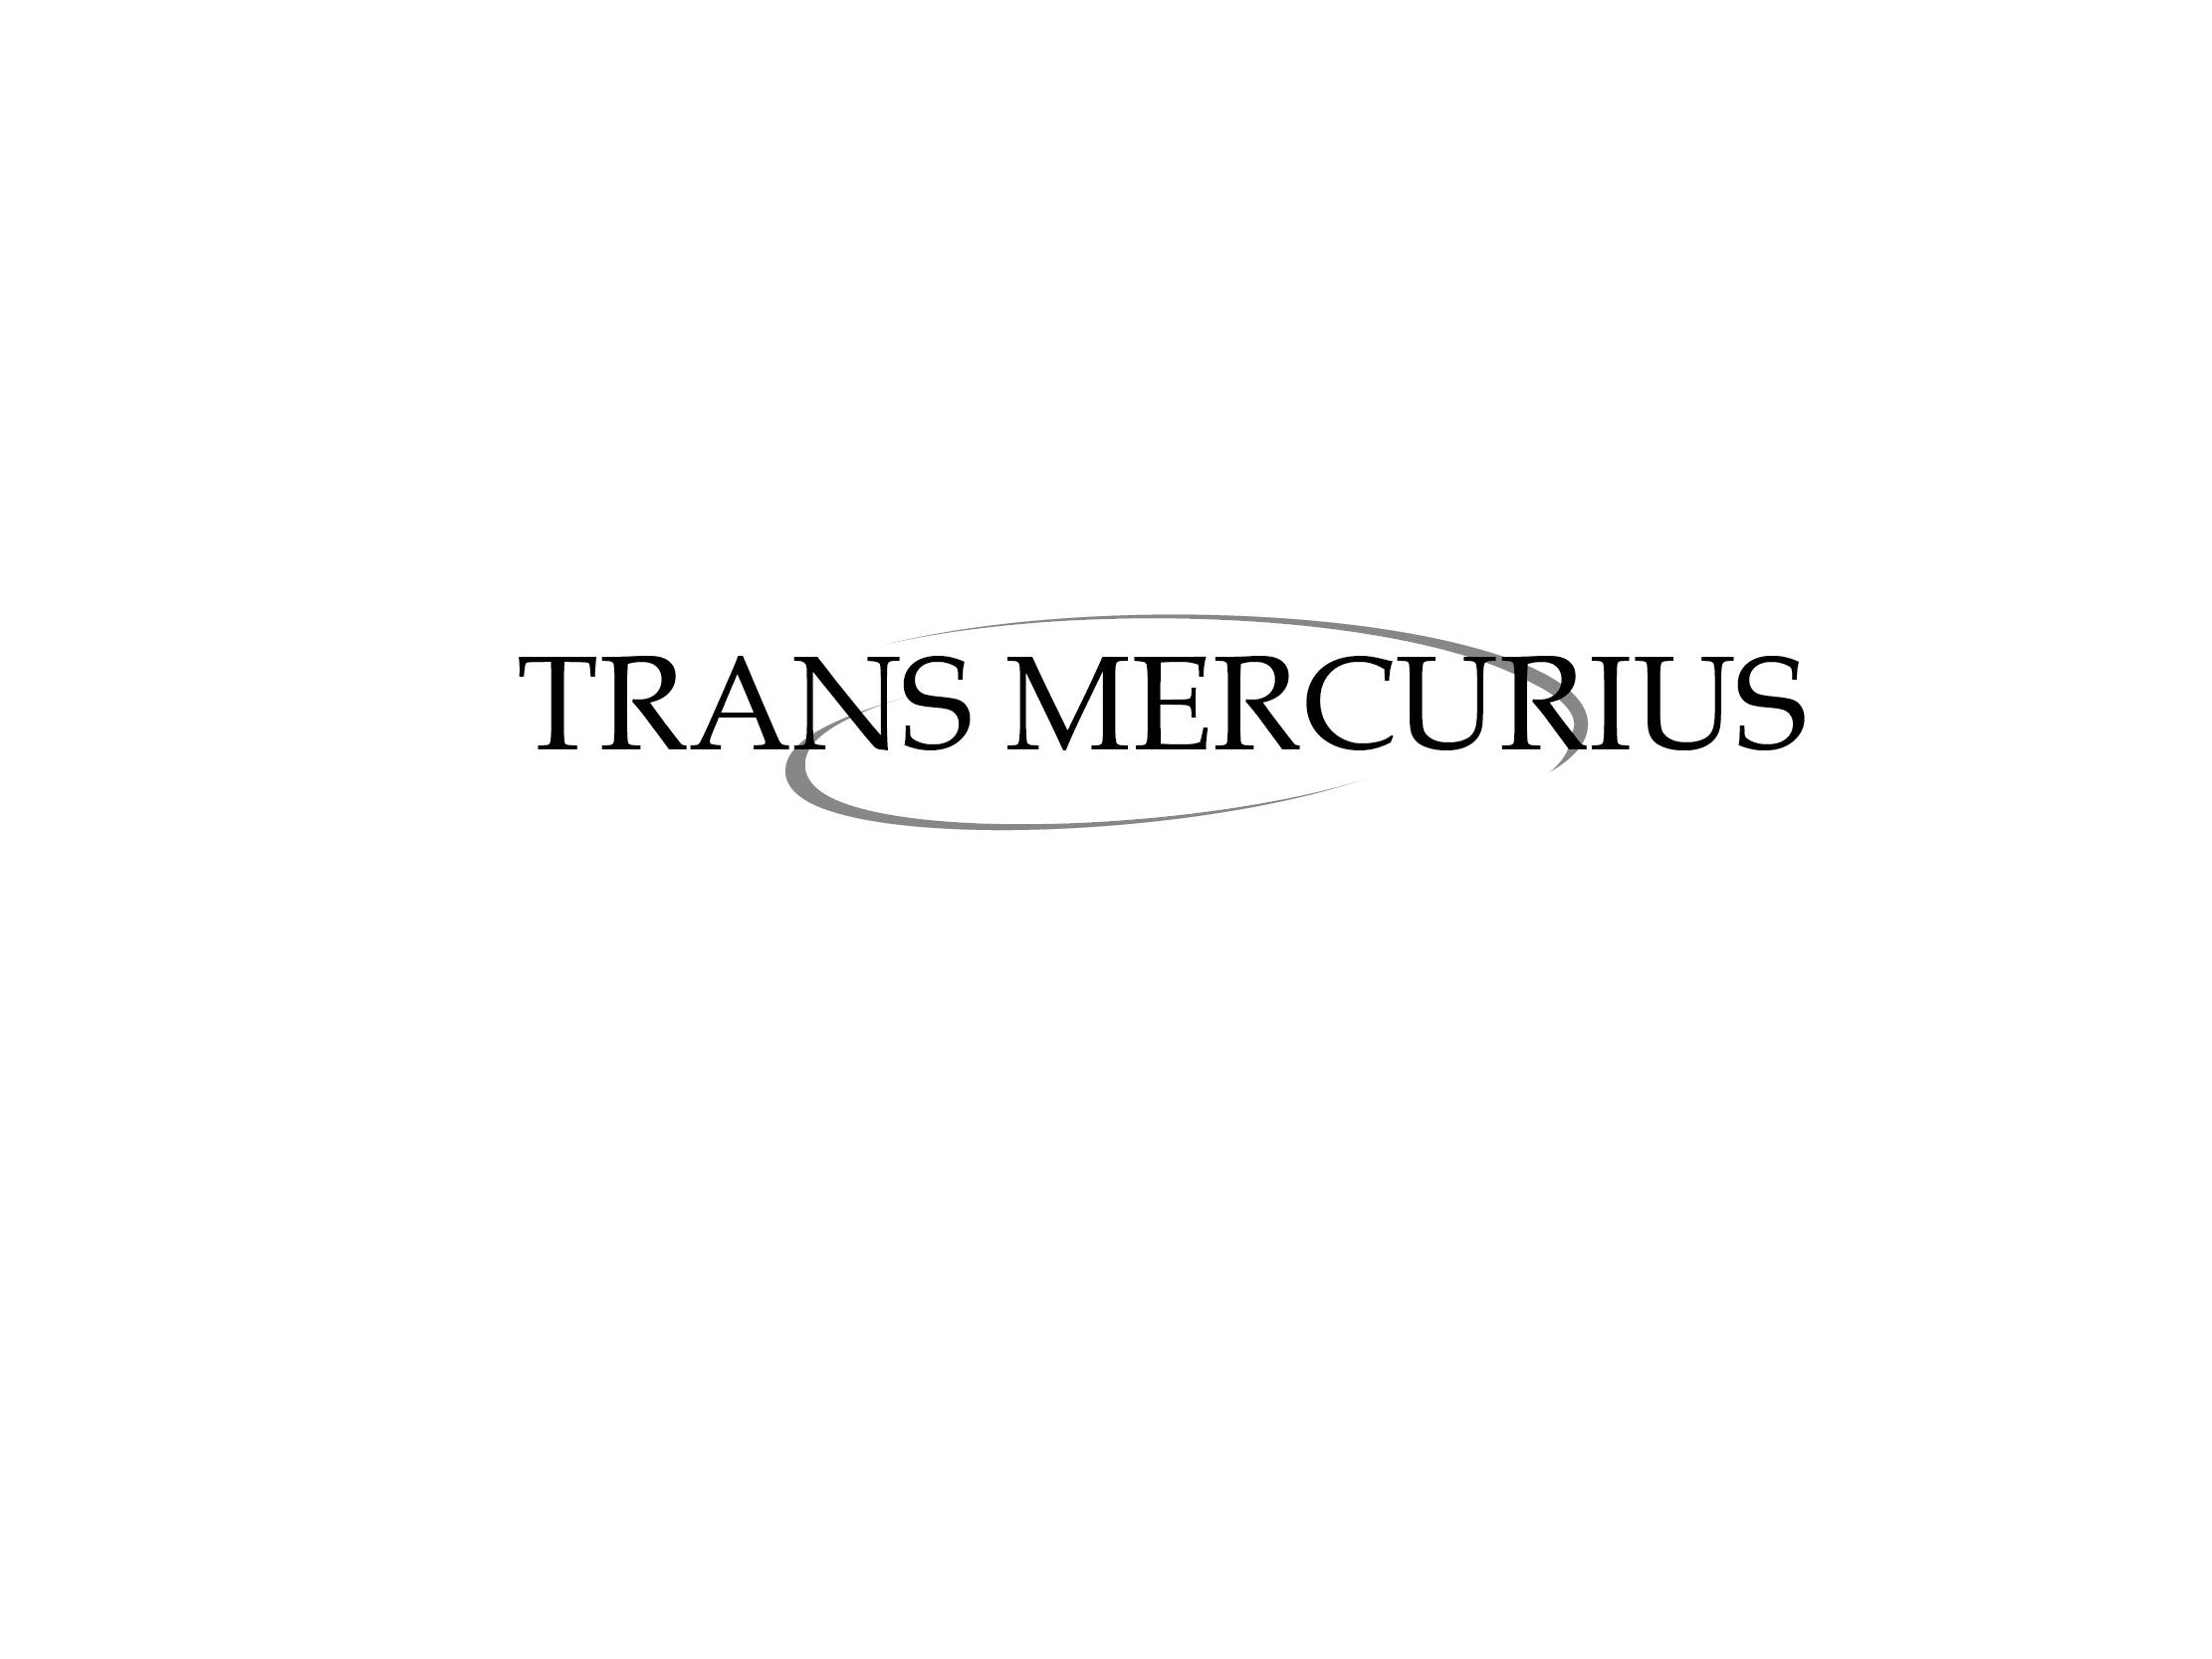 TRANS MERCURIUS Int. Frachtmanagement Inh. Sascha Götz